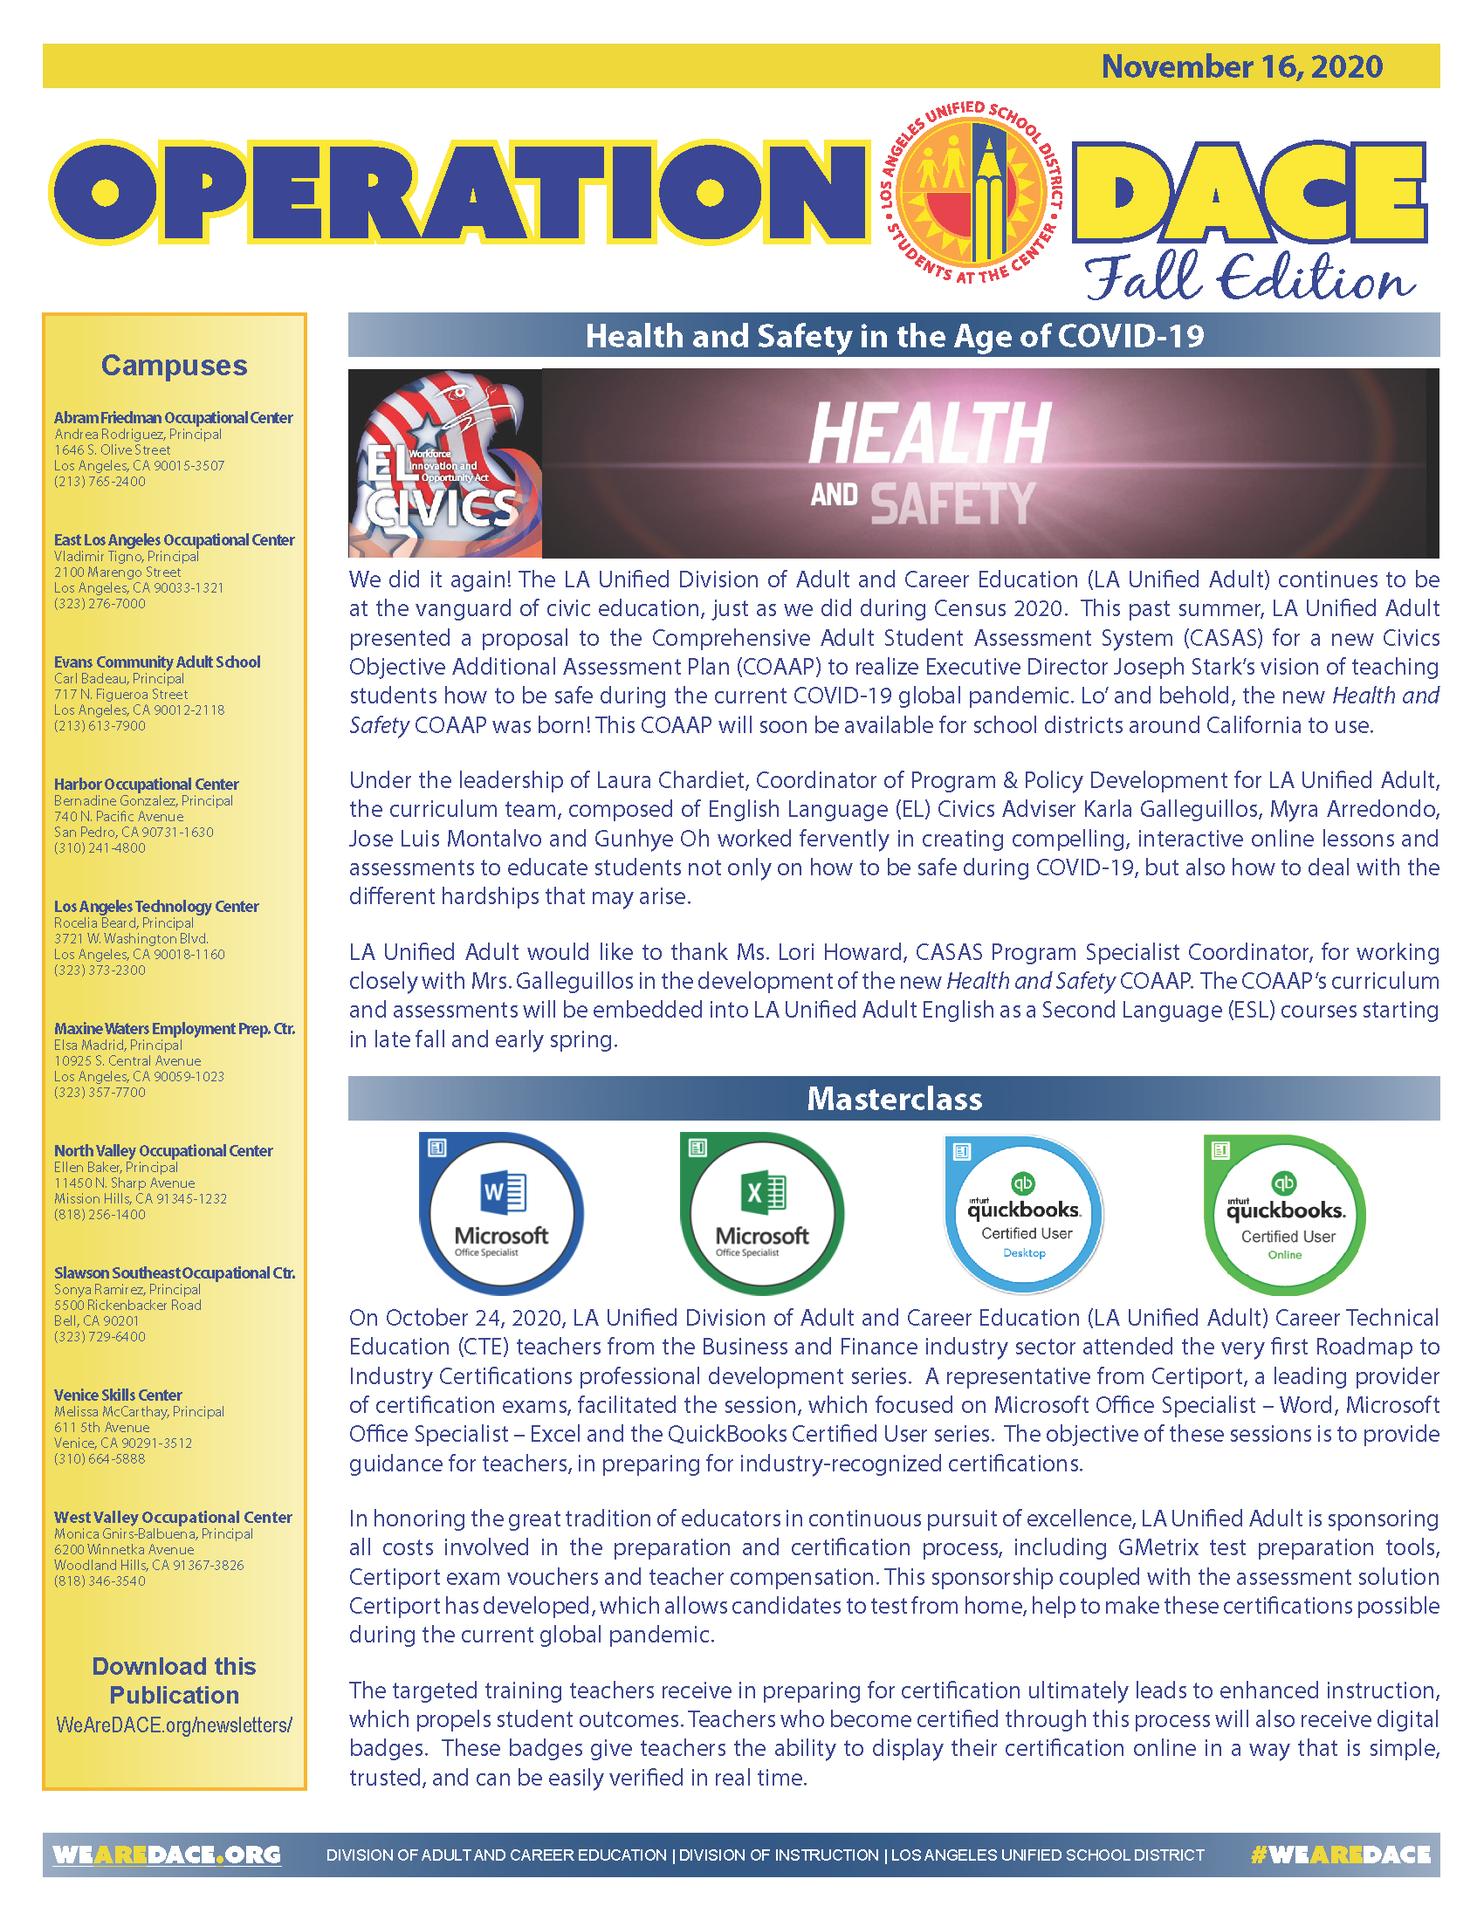 DACE Newsletter - October 19, 2020 Thumbnail